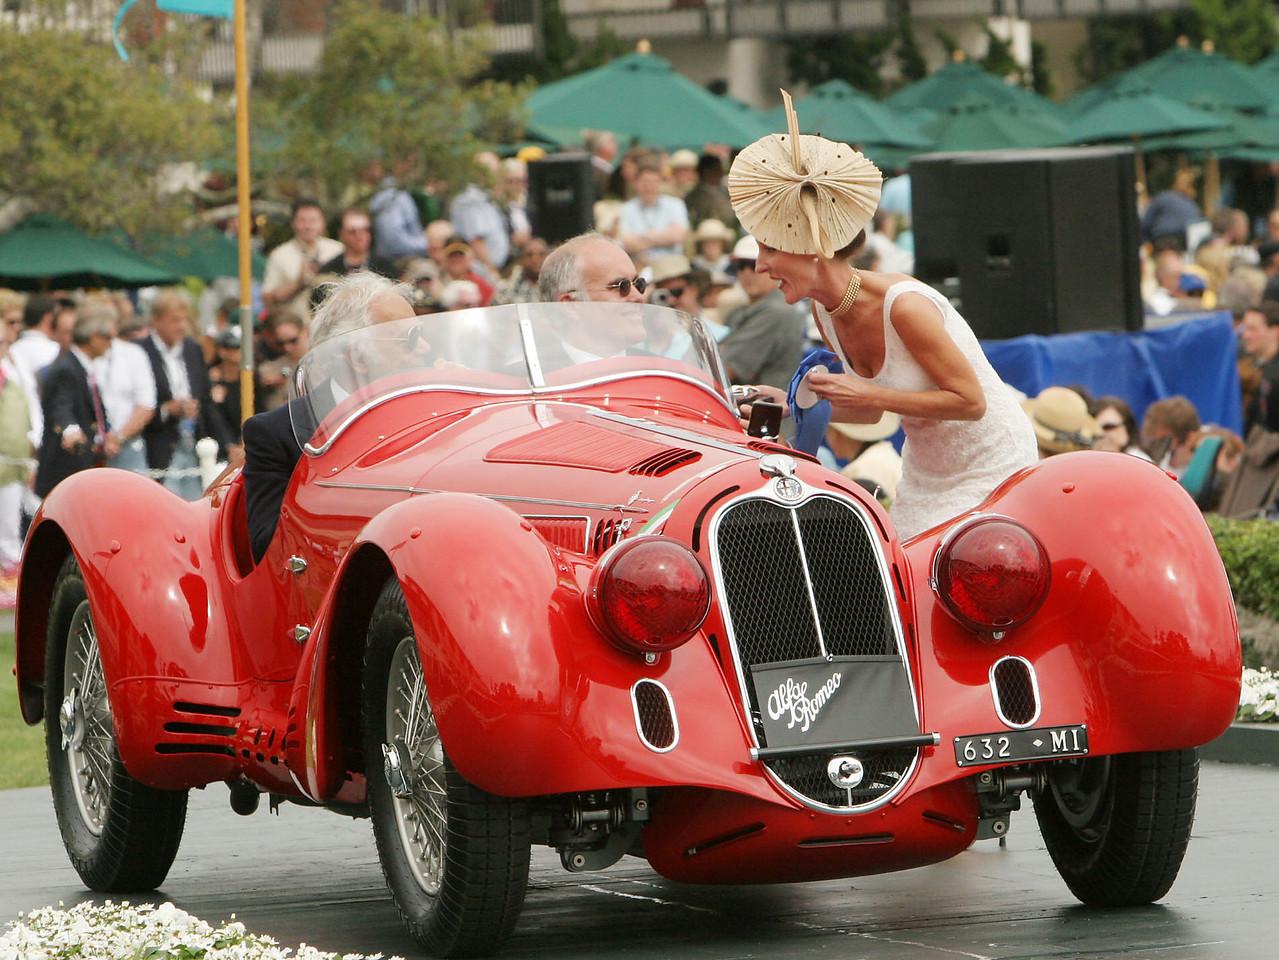 1938 Alfa Romeo 8C 2900 MM Touring Spyder owned by Ralph Lauren from New York, New York 1st Class E-2 (Alfa Romeo Prewar Race Cars)